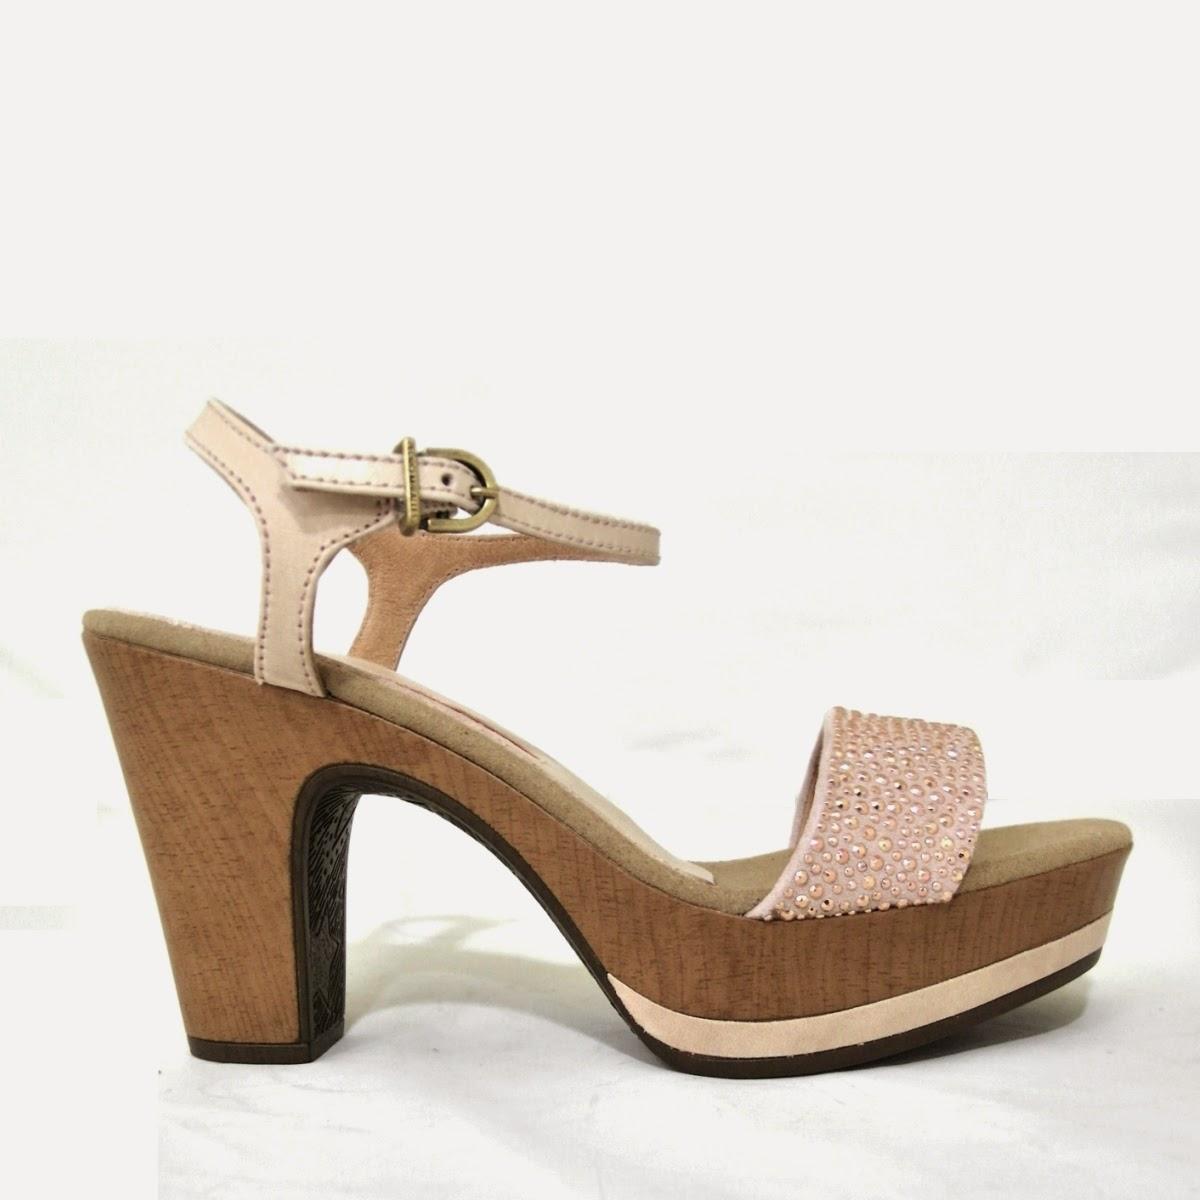 Bricoshoe-pedromiralles-SandaliasSetenteras-Elblogdepatricia-Shoe-calzado-calzature-scarpe-chaussures